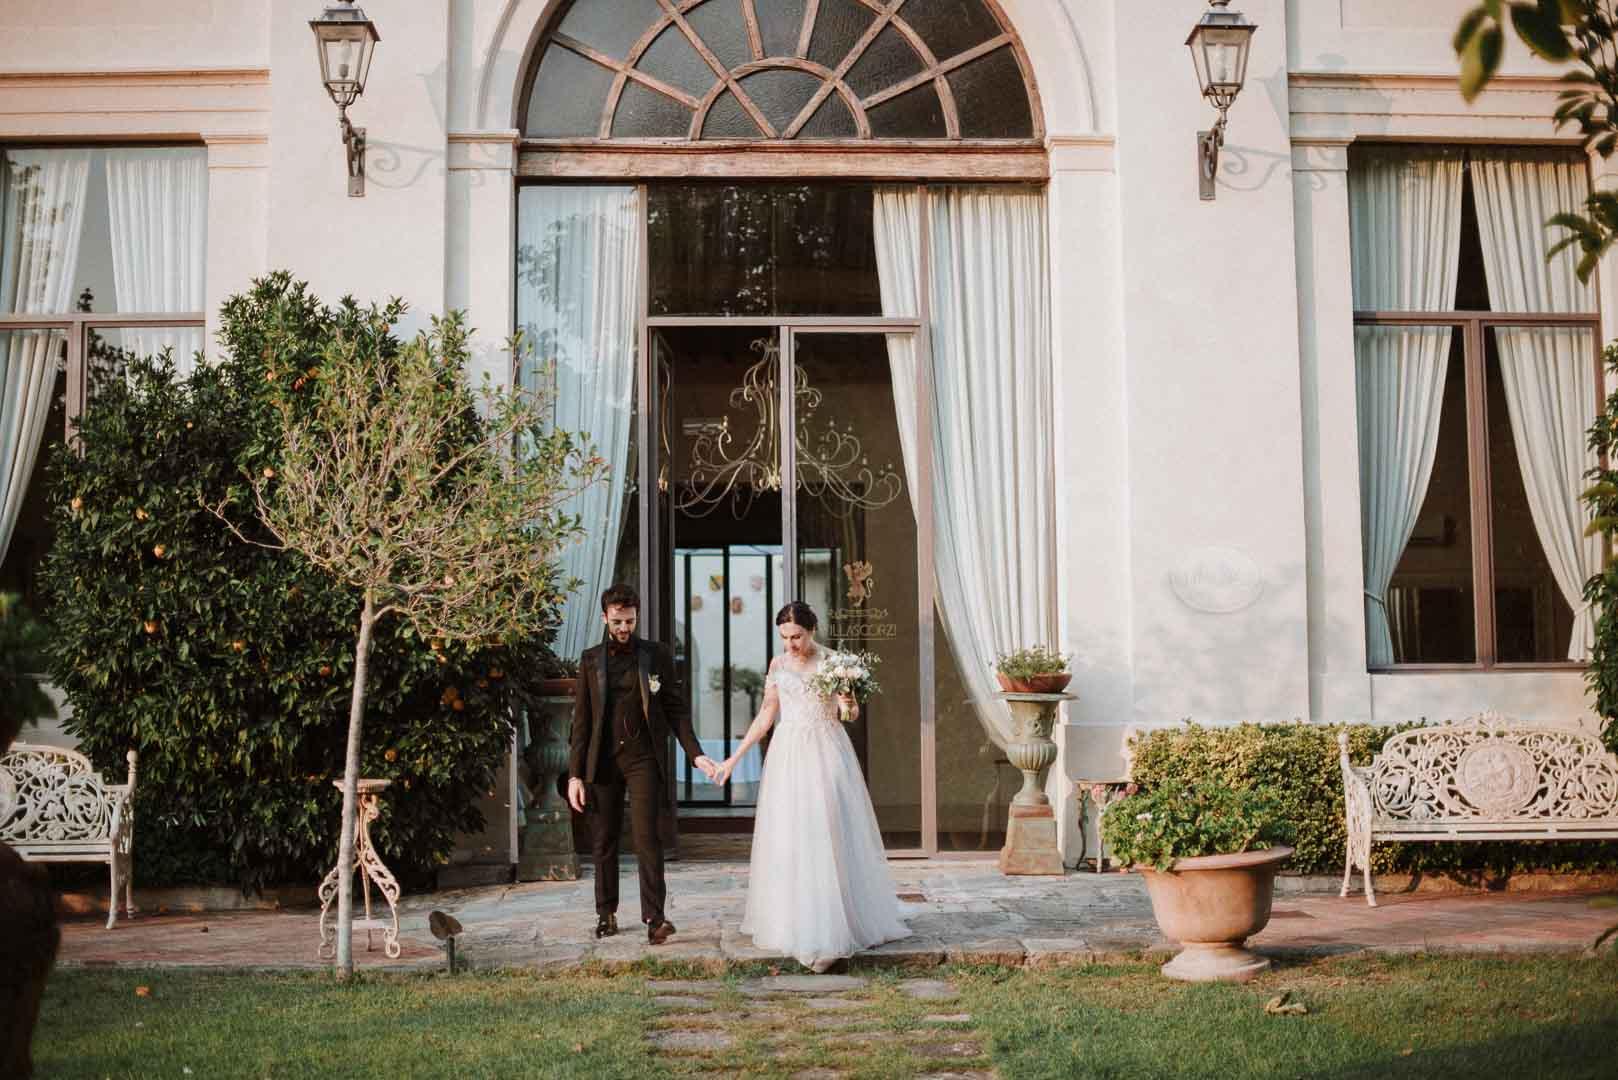 wedding-photographer-destination-fineart-bespoke-reportage-tuscany-villascorzi-vivianeizzo-spazio46-132